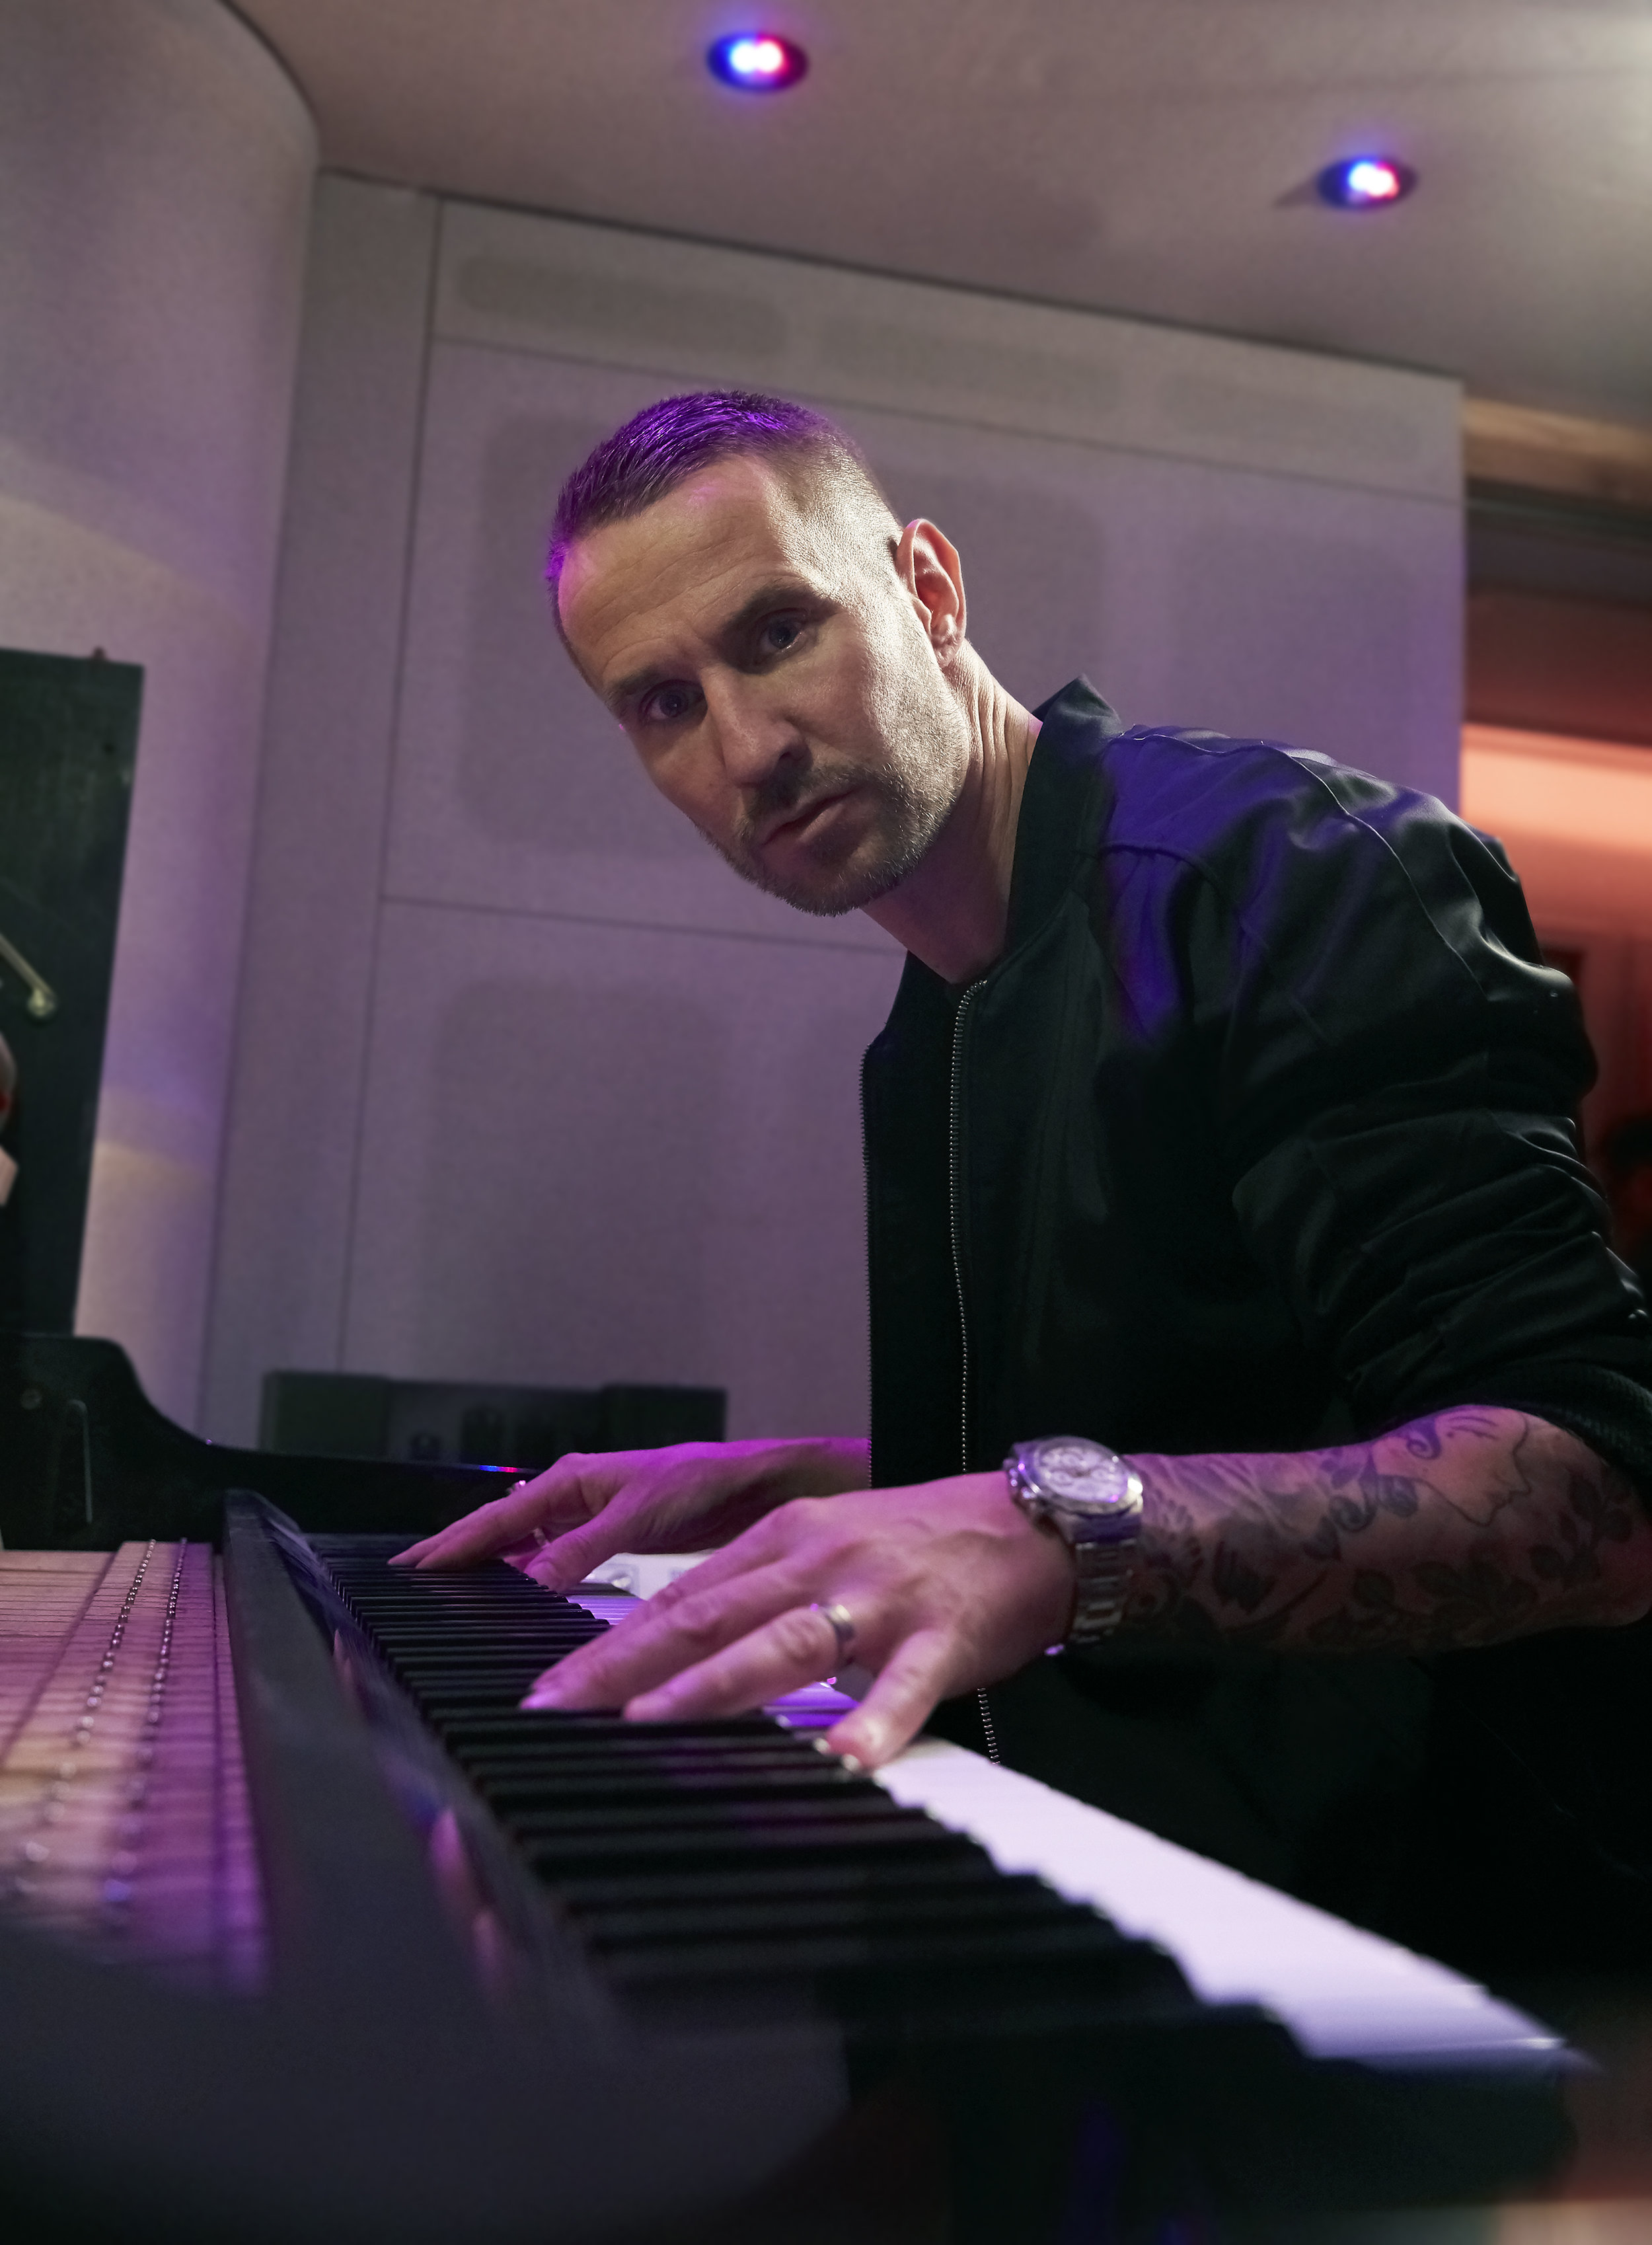 Piano single .jpg